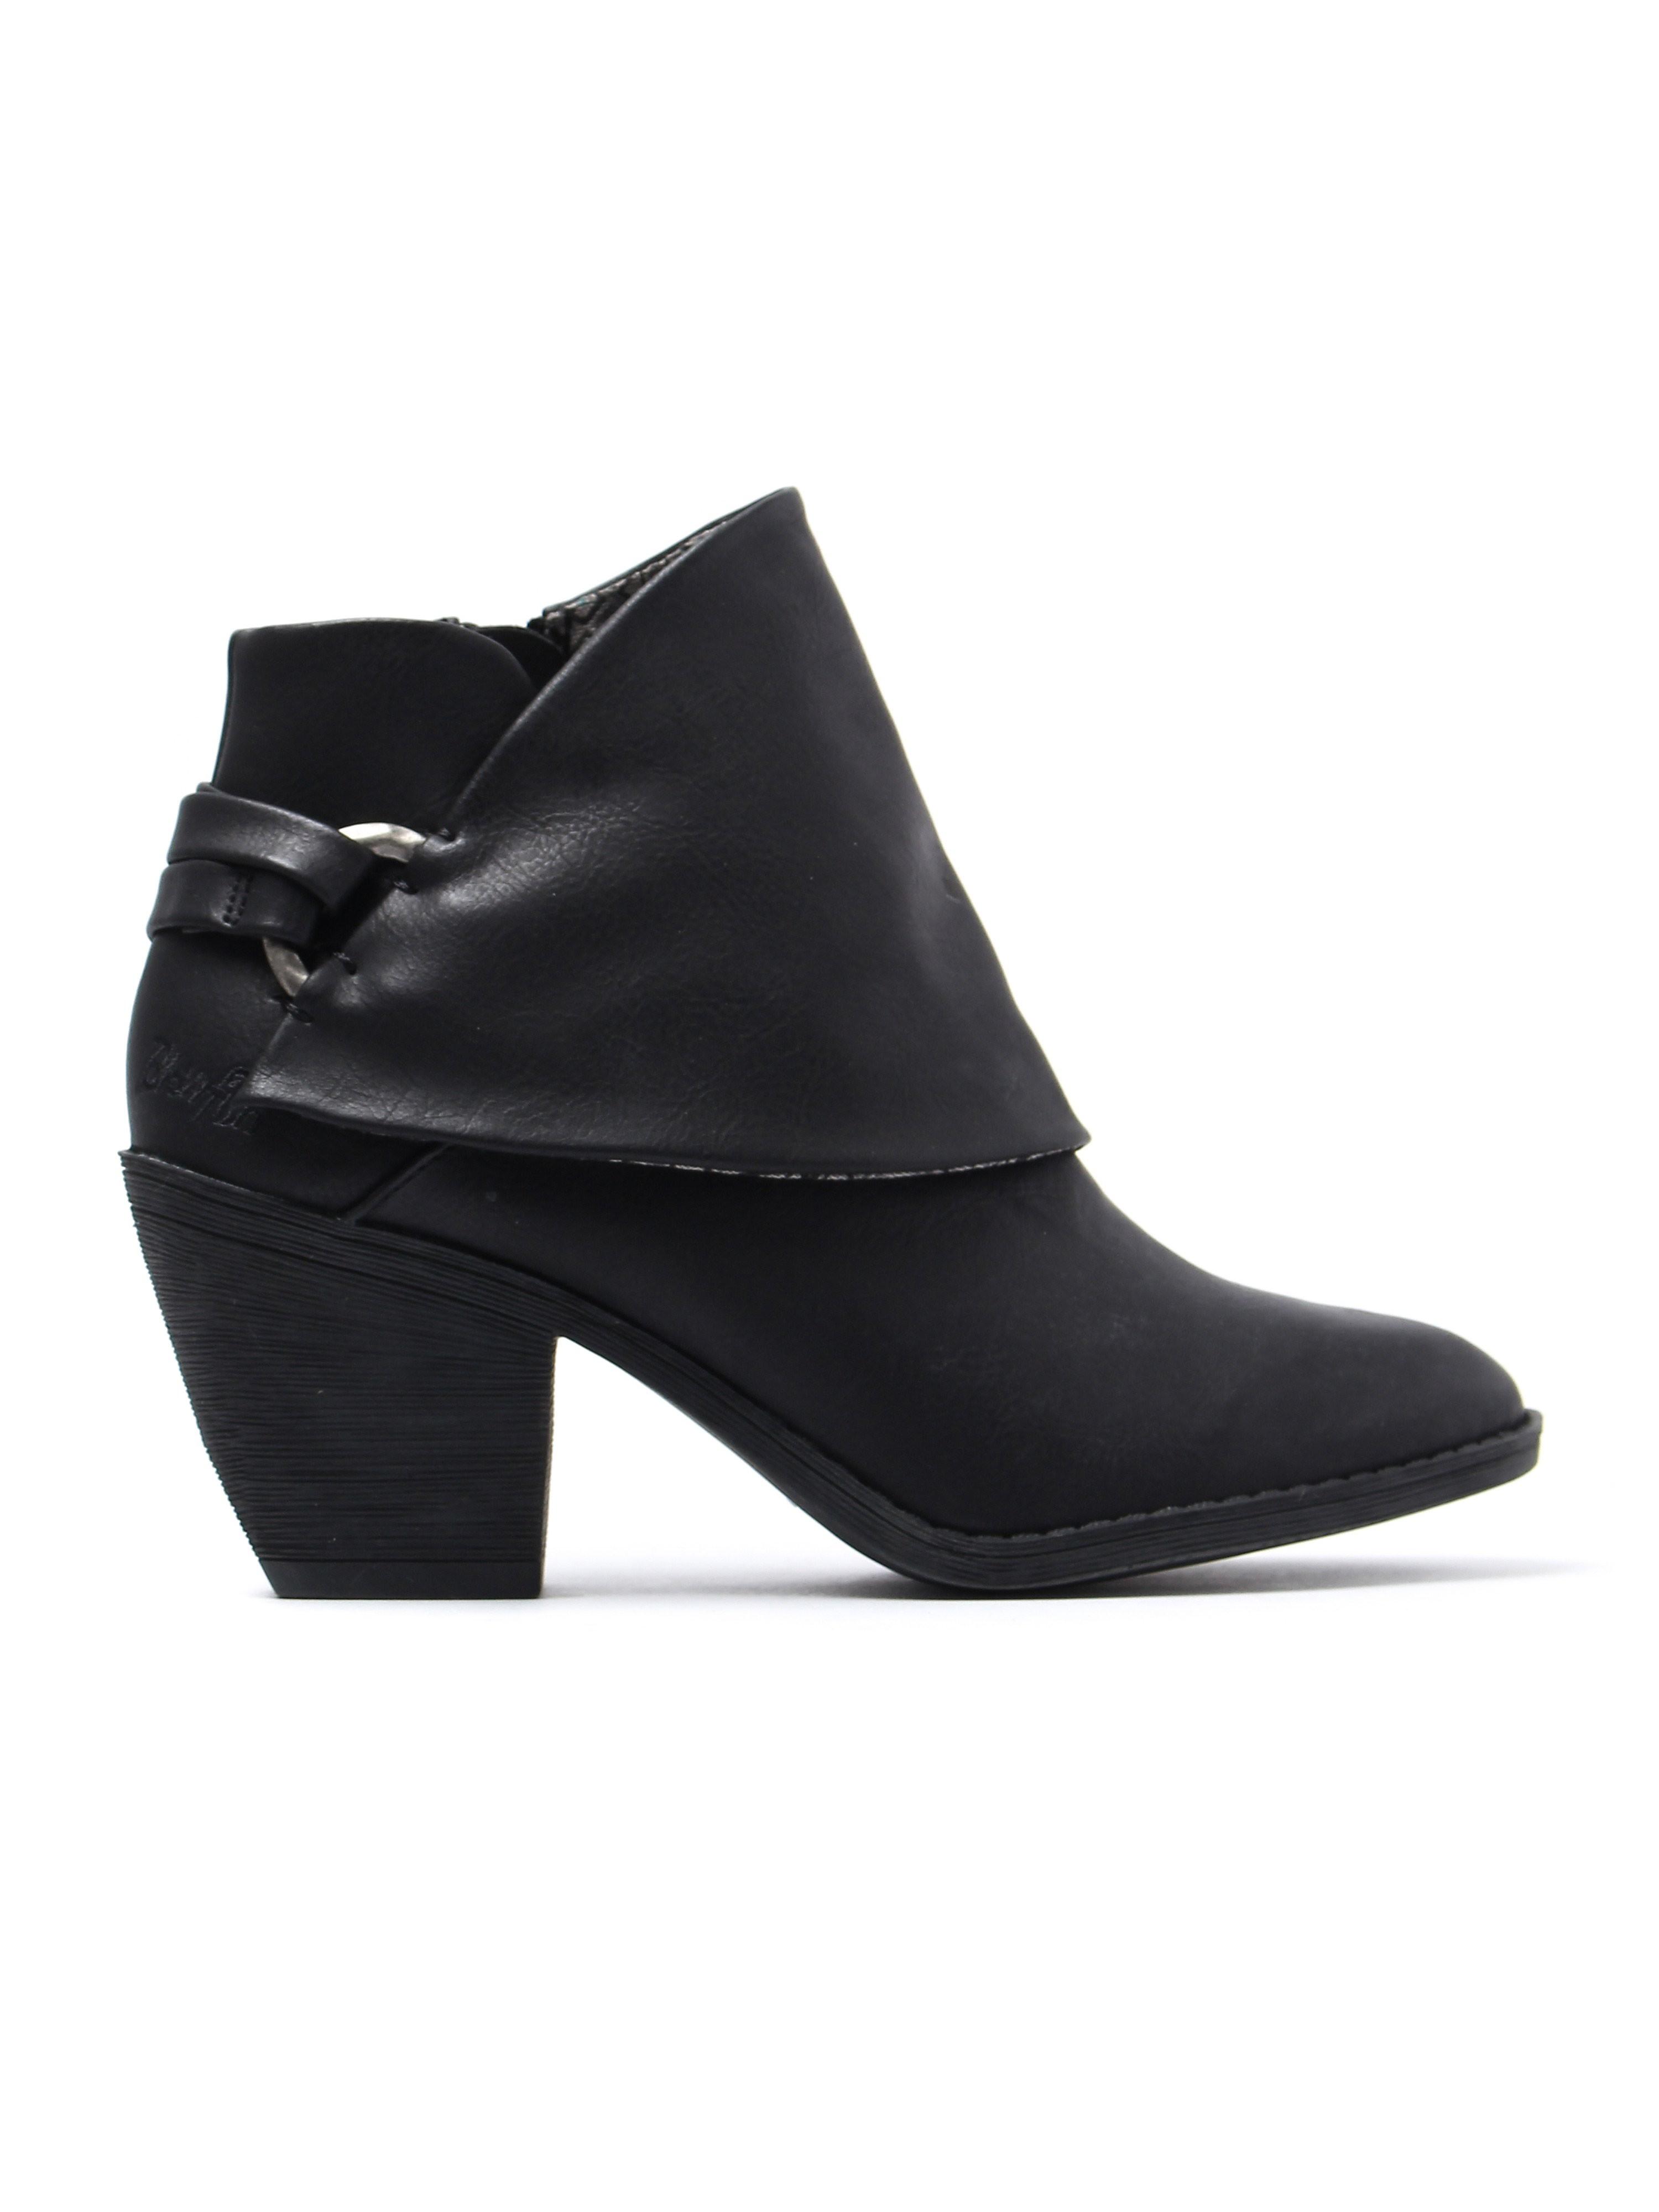 Blowfish Women's Super Duper Ankle Boots - Black Lonestar